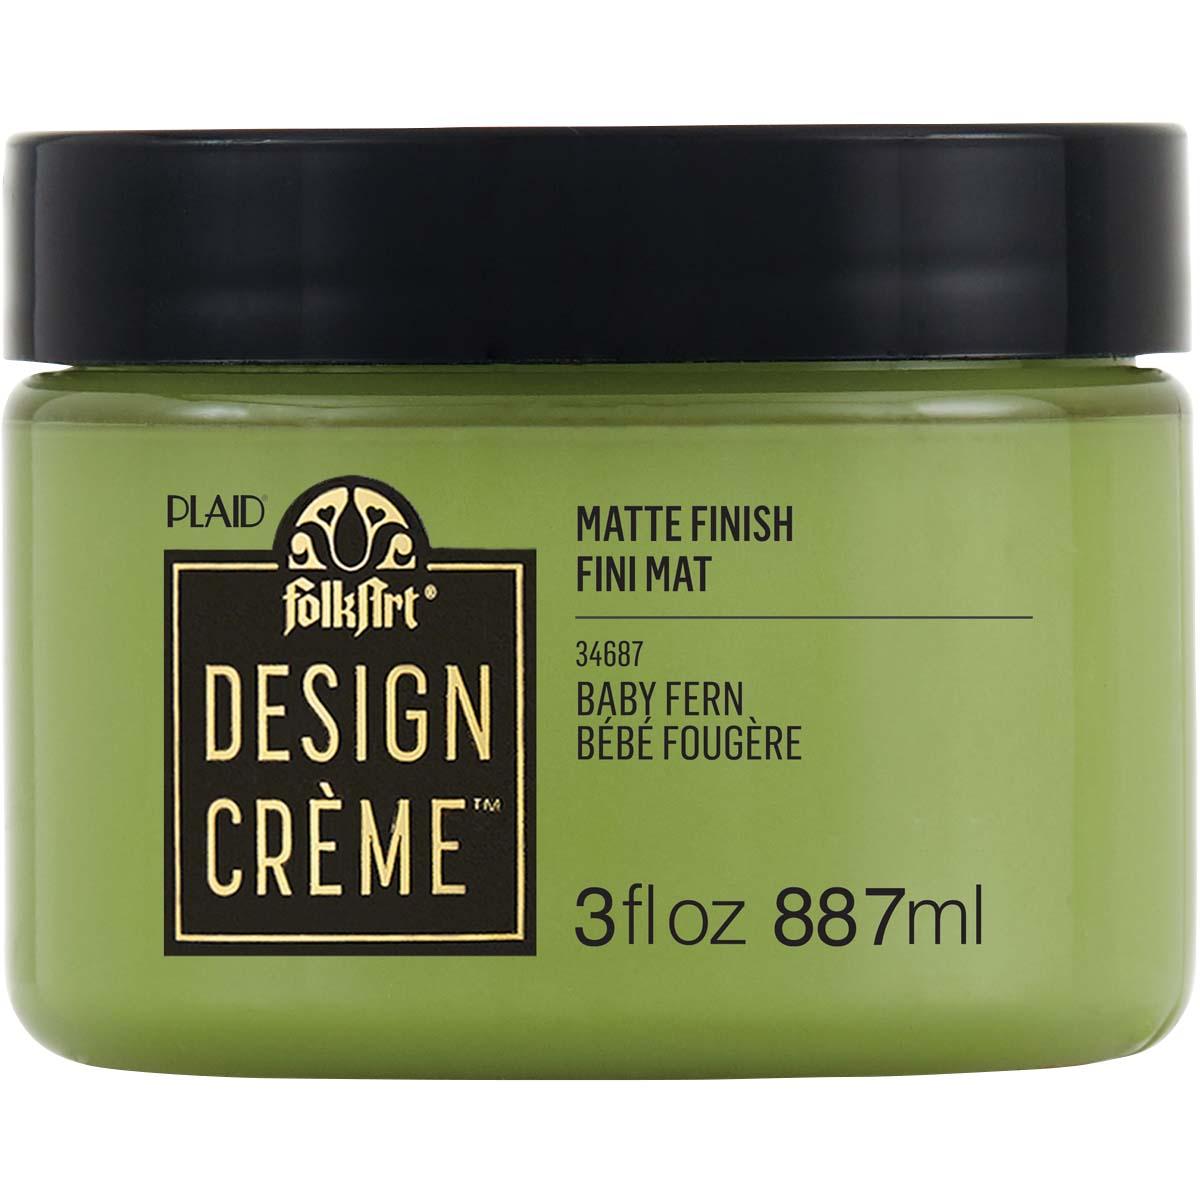 FolkArt ® Design Creme™ - Baby Fern, 3 oz. - 34687